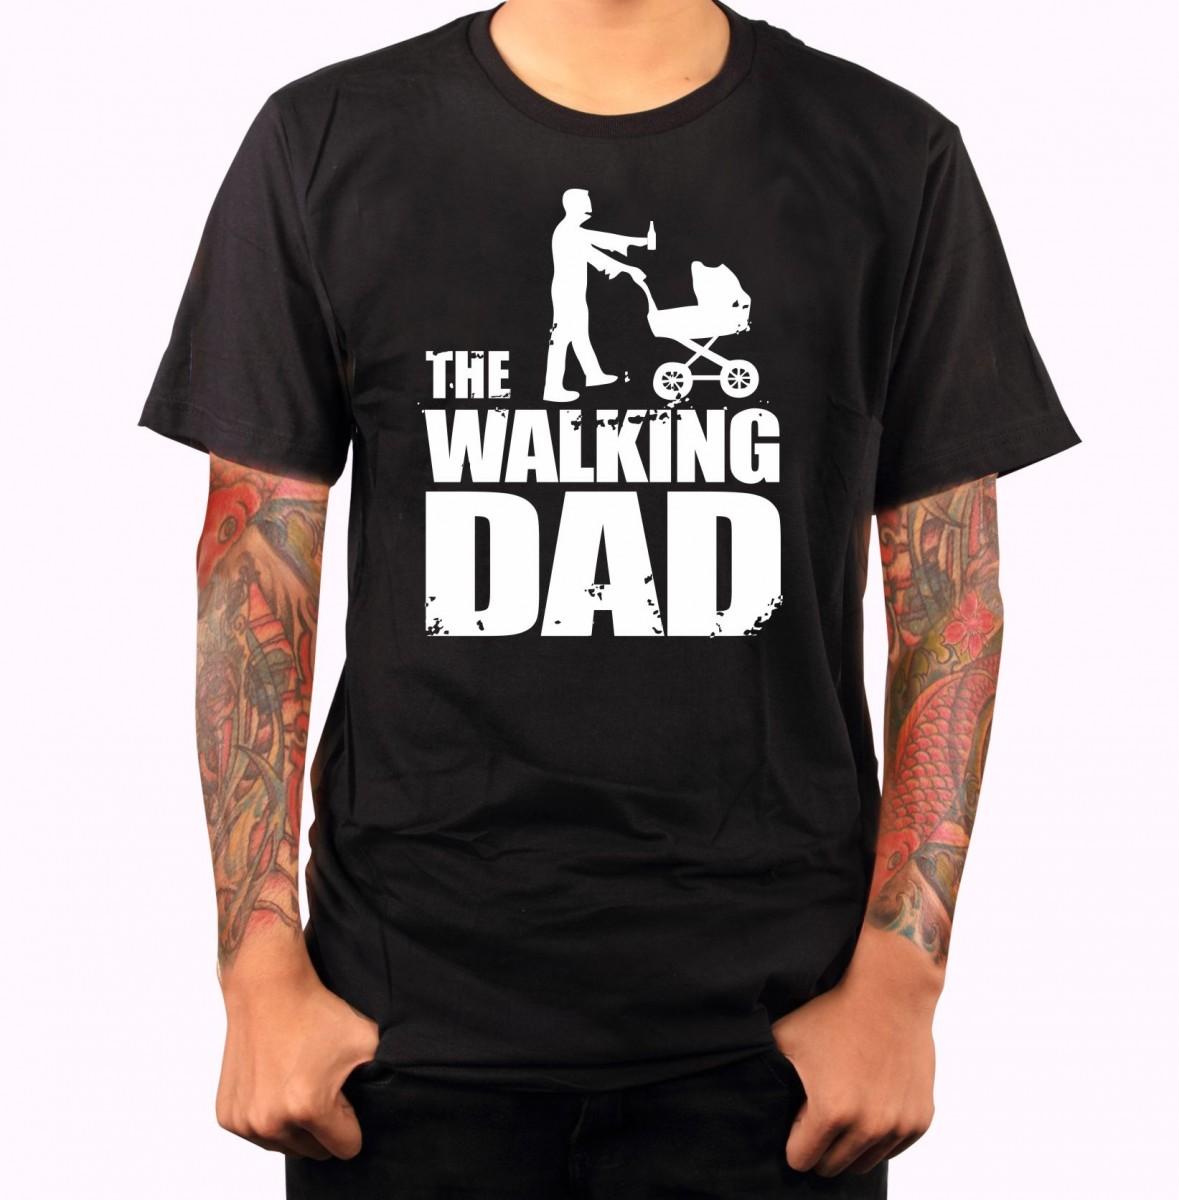 d87f8097ca17 Vtipné tričko s potlačou - The Wlaking dad ǀ Fajntričko.sk